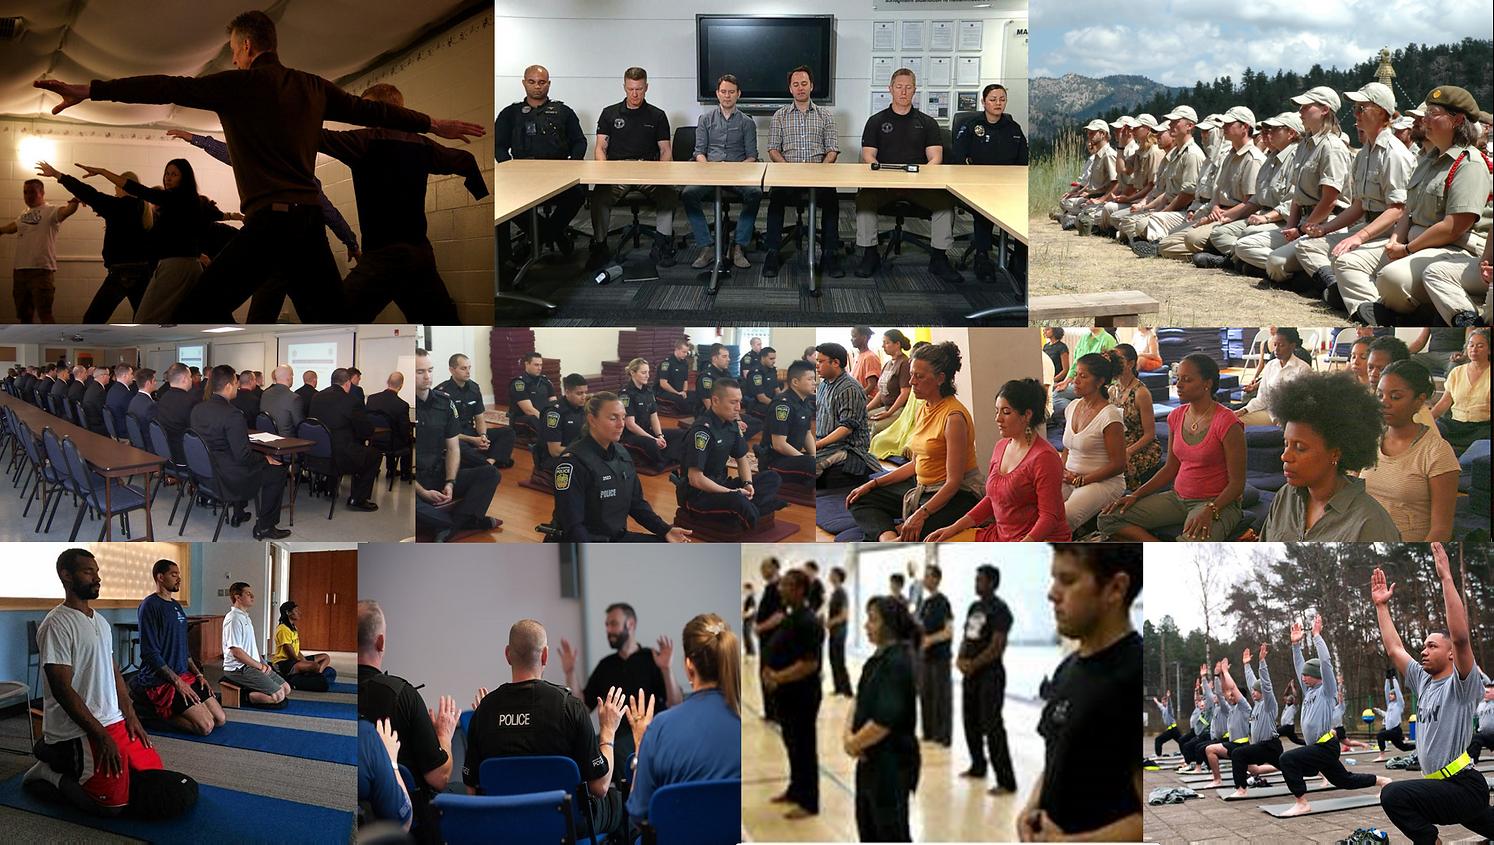 webcentrepolice.png